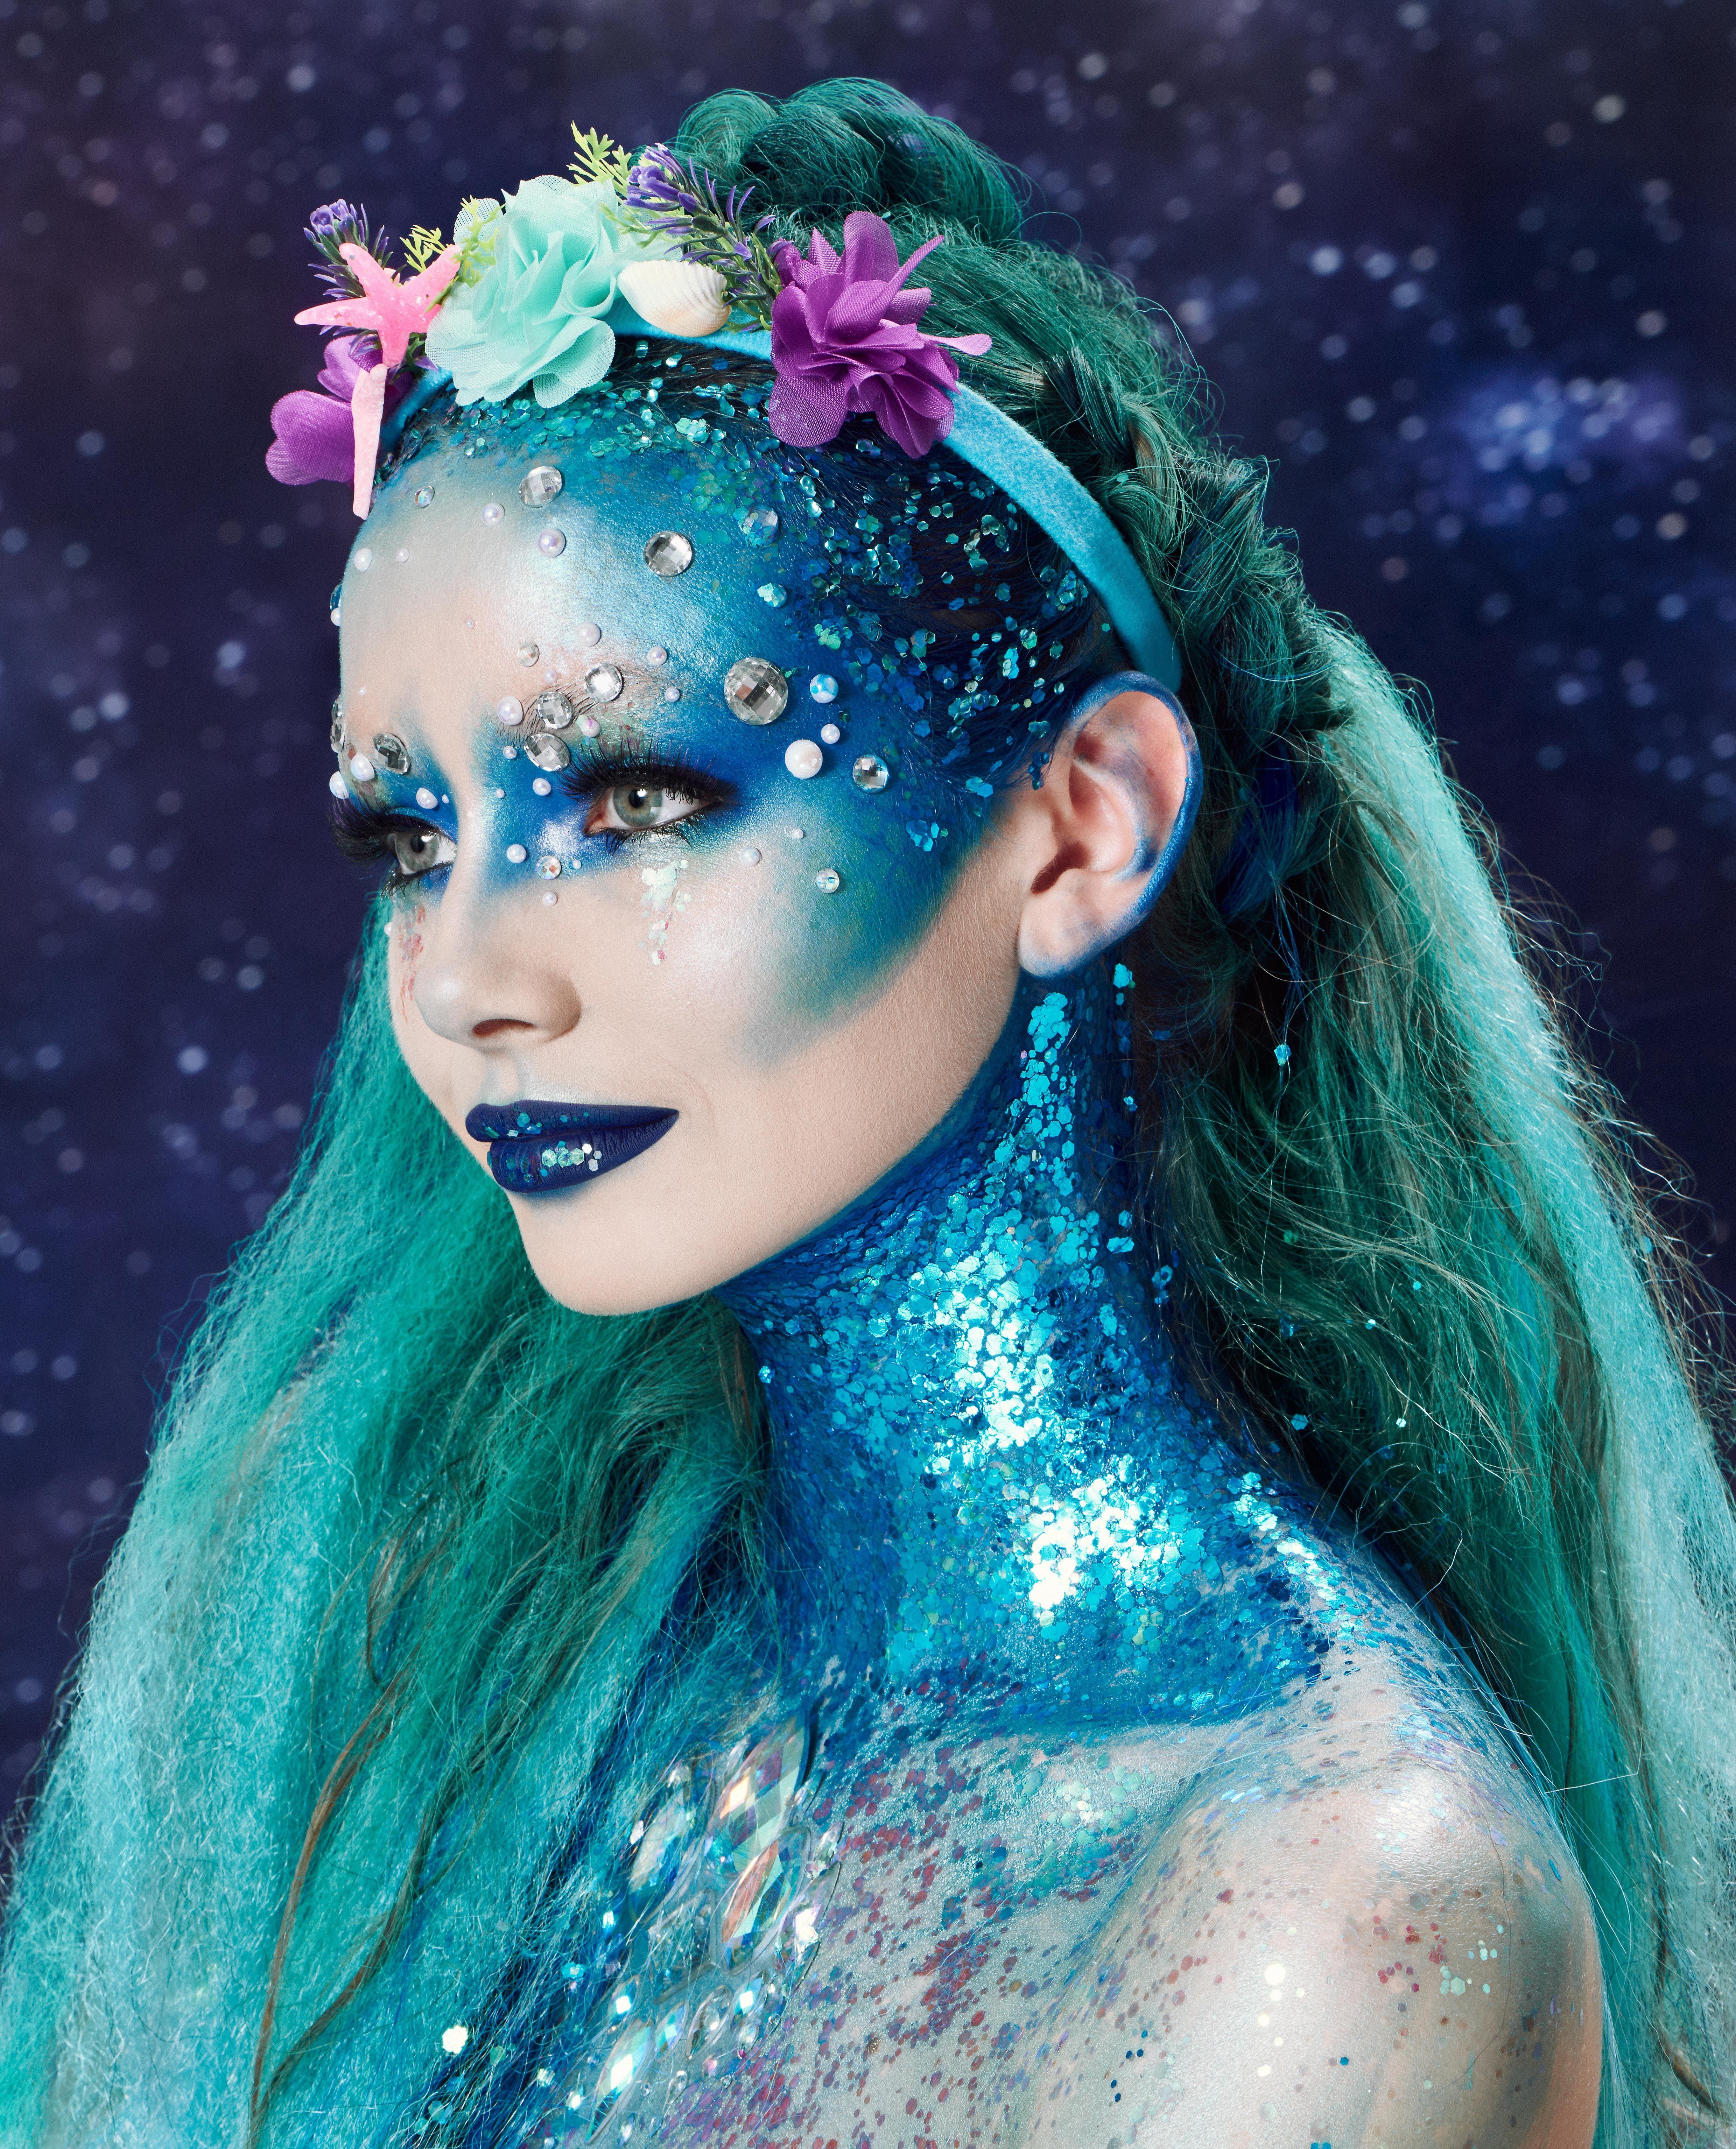 Halloween hair ideas 2018 Enchanted Mermaid. Looking for